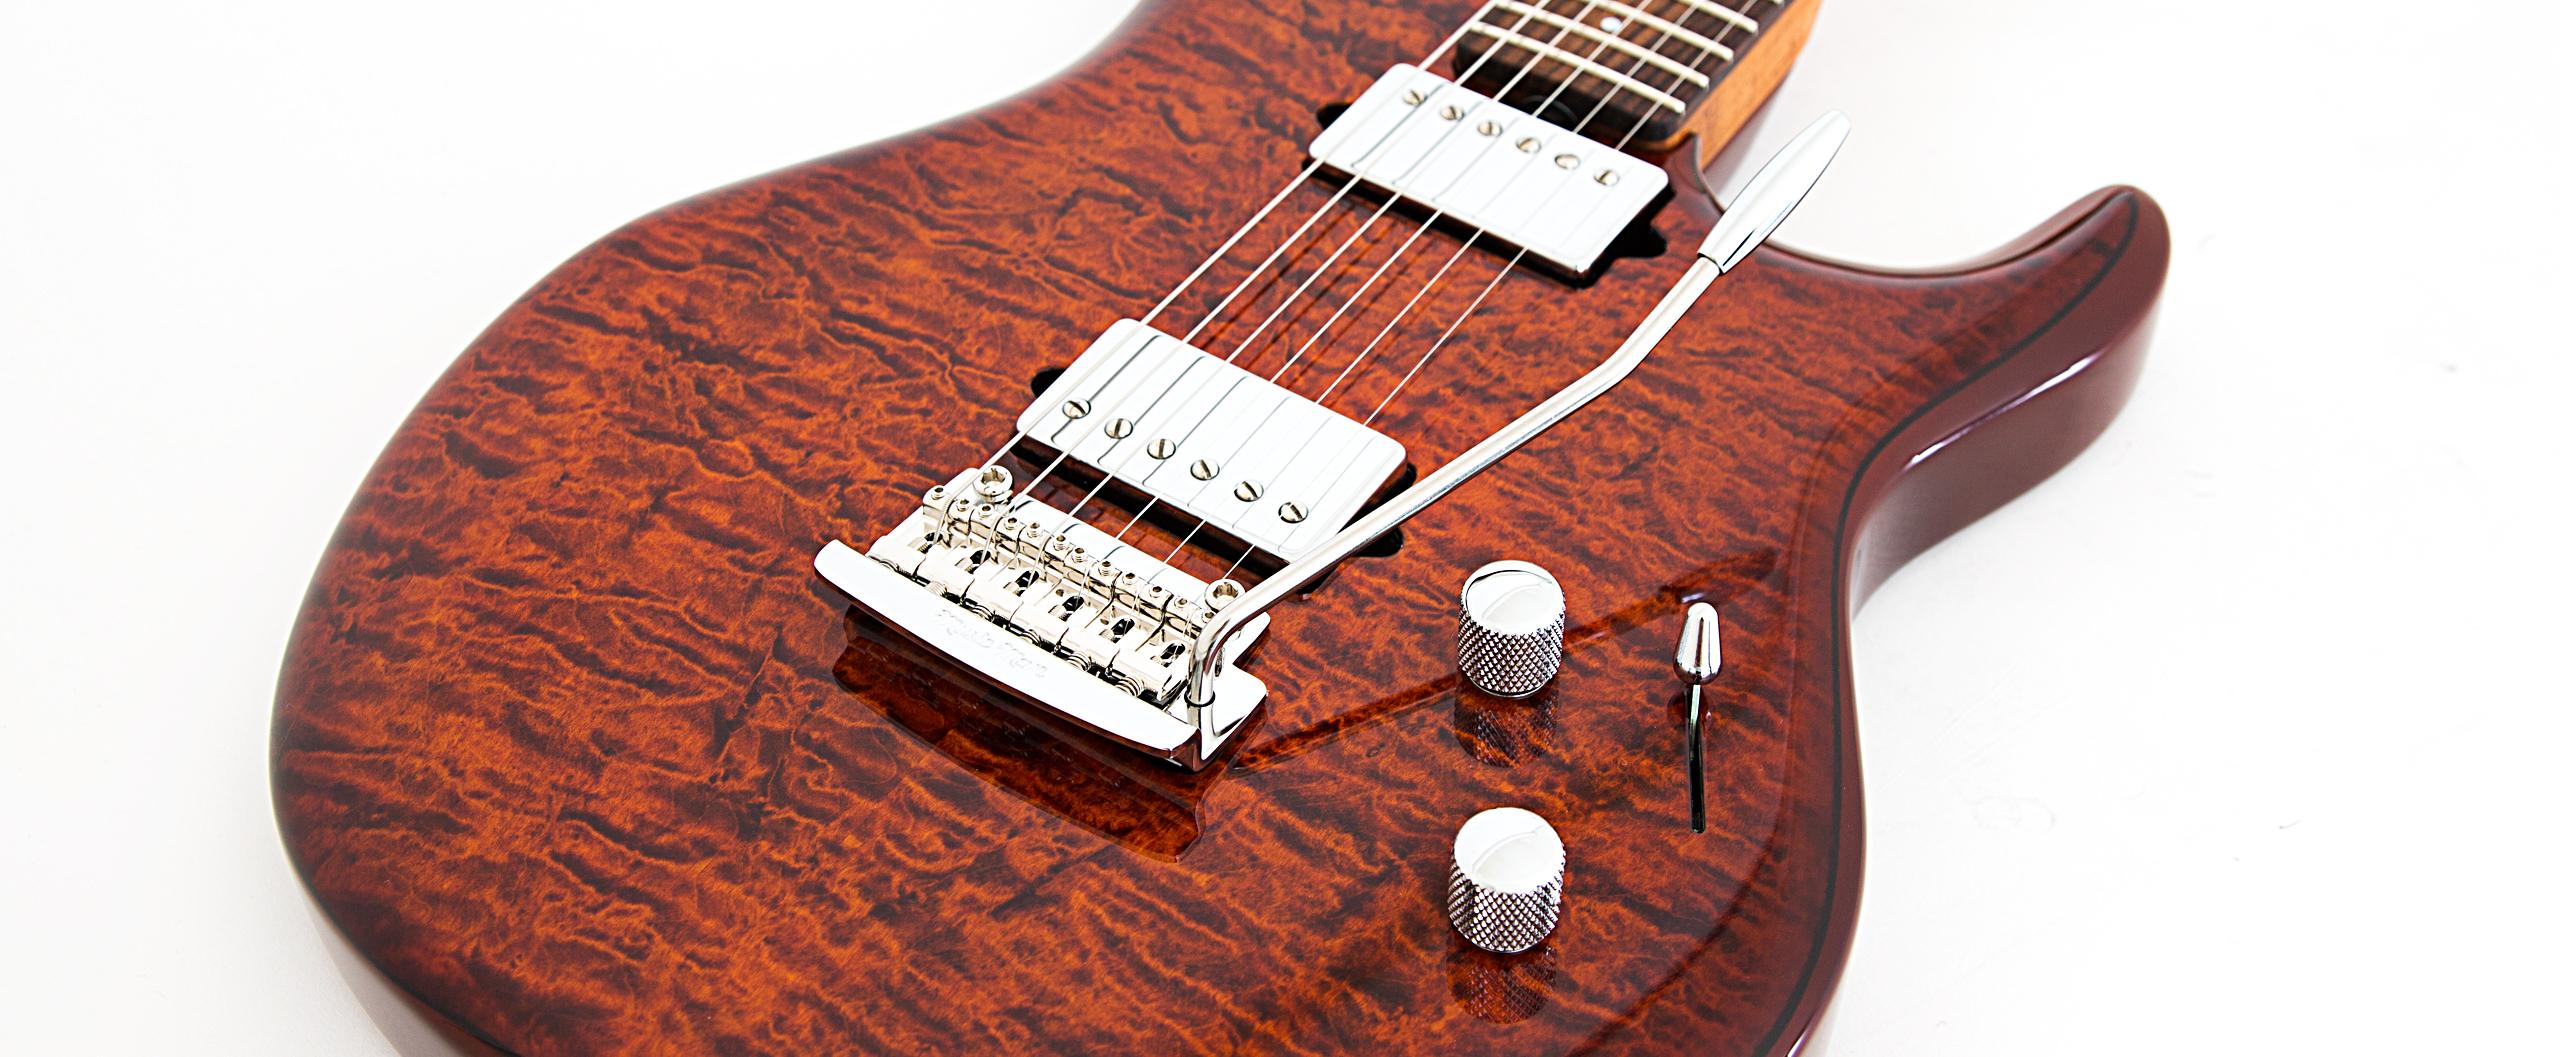 Luke Iii Bfr Guitars Ernie Ball Music Man Guitar Wiring Diagram 2 Volume 1 Tone Slide